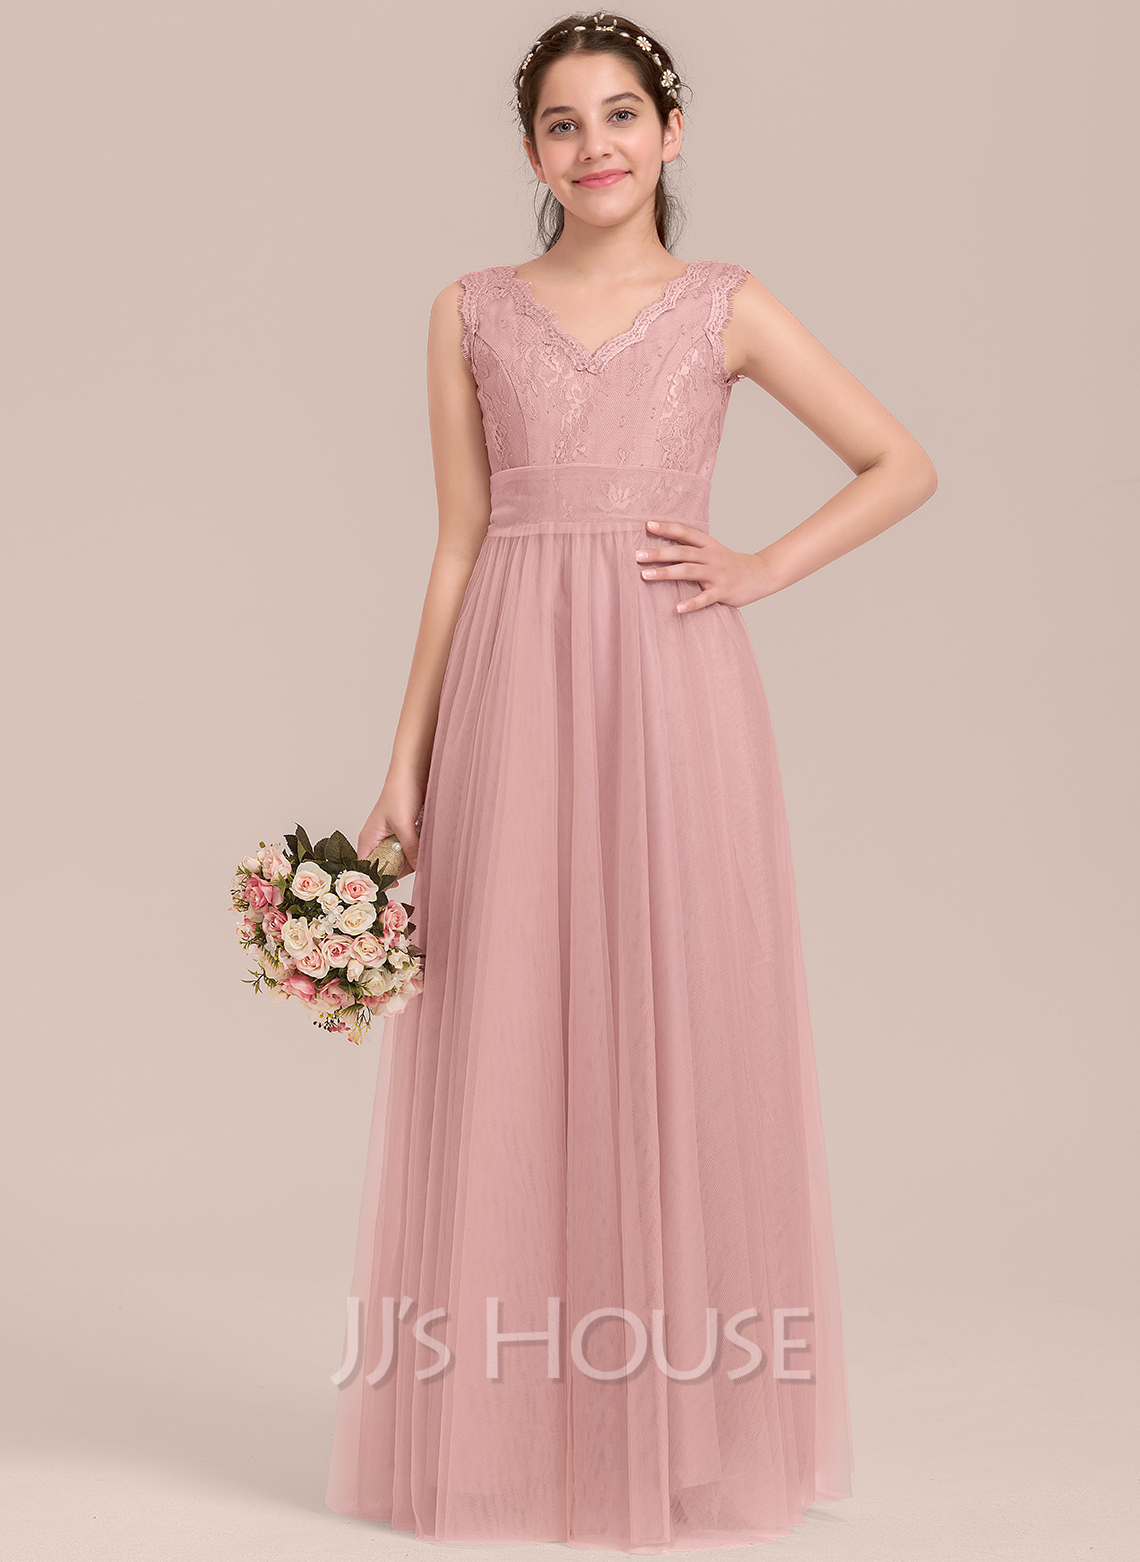 A-Line V-neck Floor-Length Tulle Junior Bridesmaid Dress